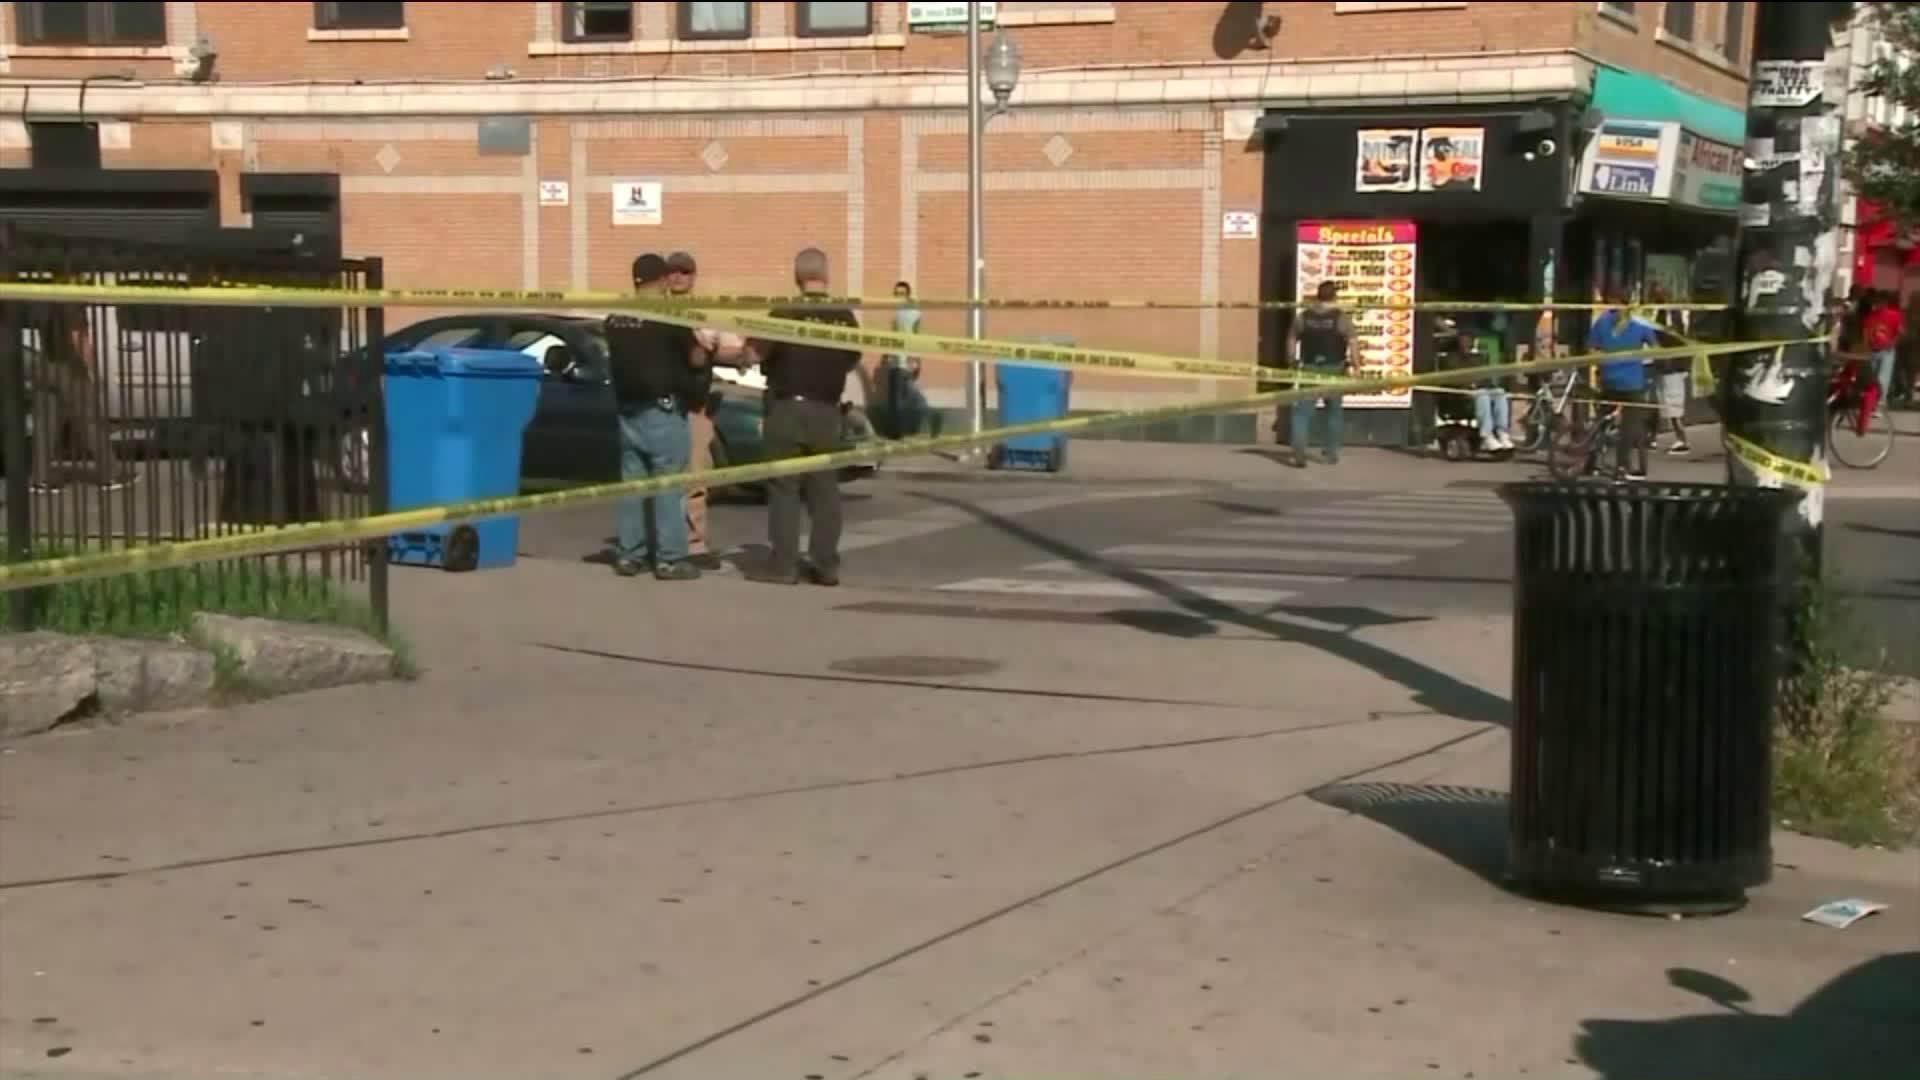 3 Killed In West Garfield Park Attack Identified Suspect Car Found Wgn Tv